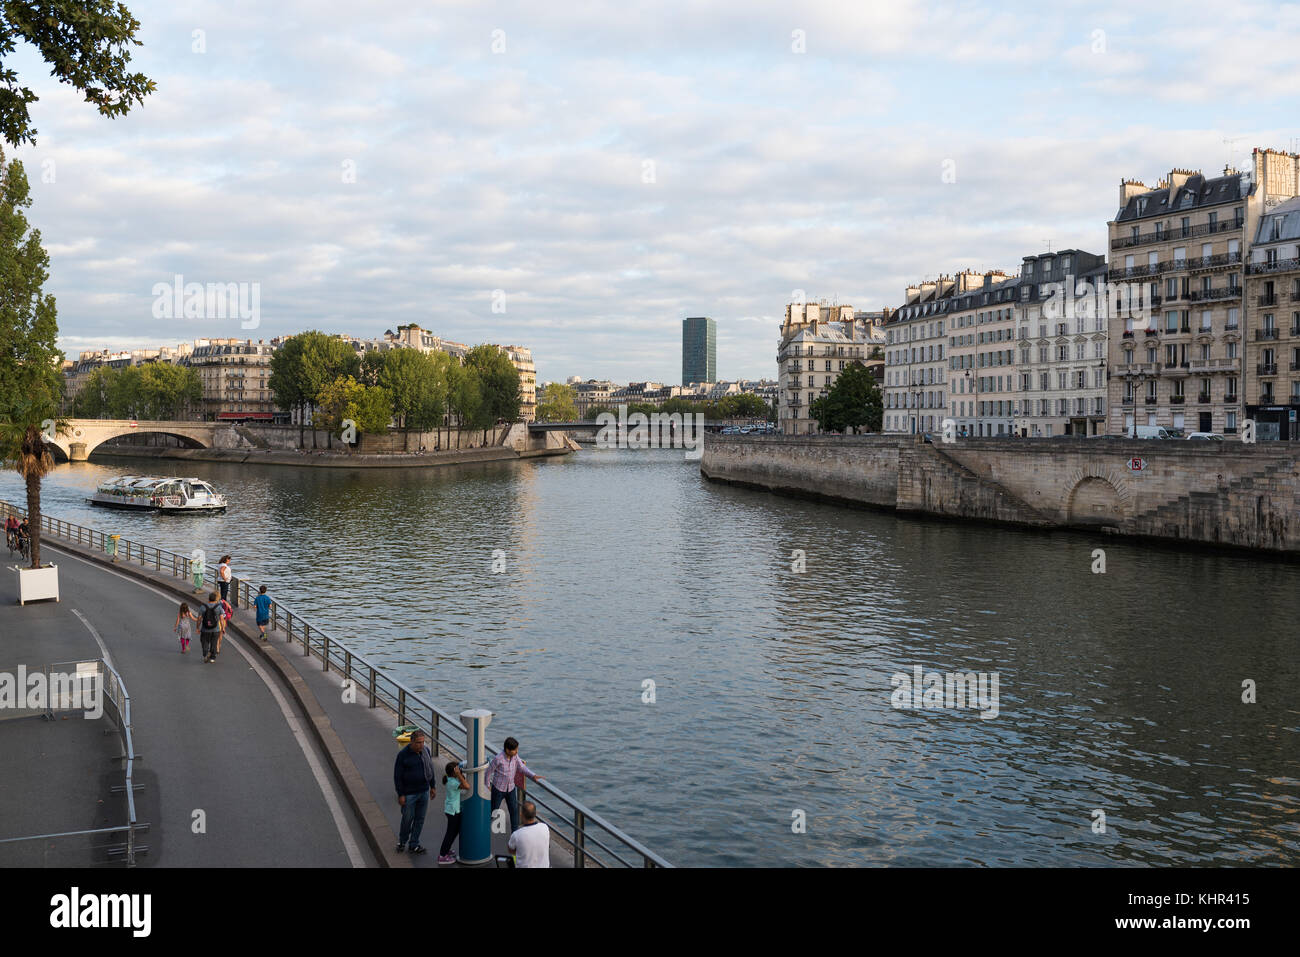 Miscellaneous images of Paris. Landmarks, tourist sights, buildings Stock Photo